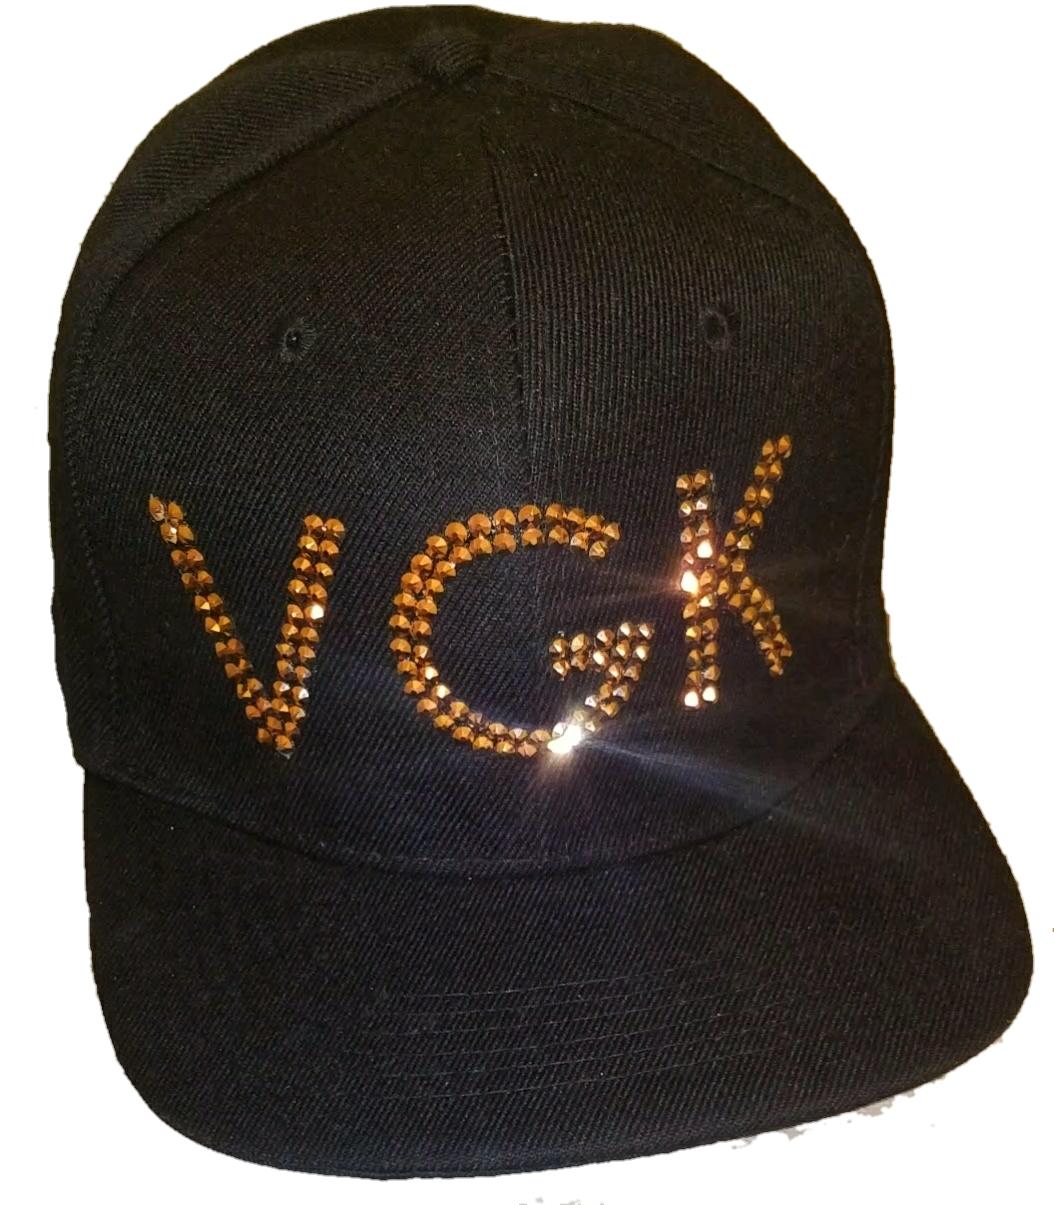 26bca0f841556 For NHL Vegas Golden Knights Fans  Swarovski® Crystal VGK Snapback Cap Hat.  BLING IT ON! on Storenvy